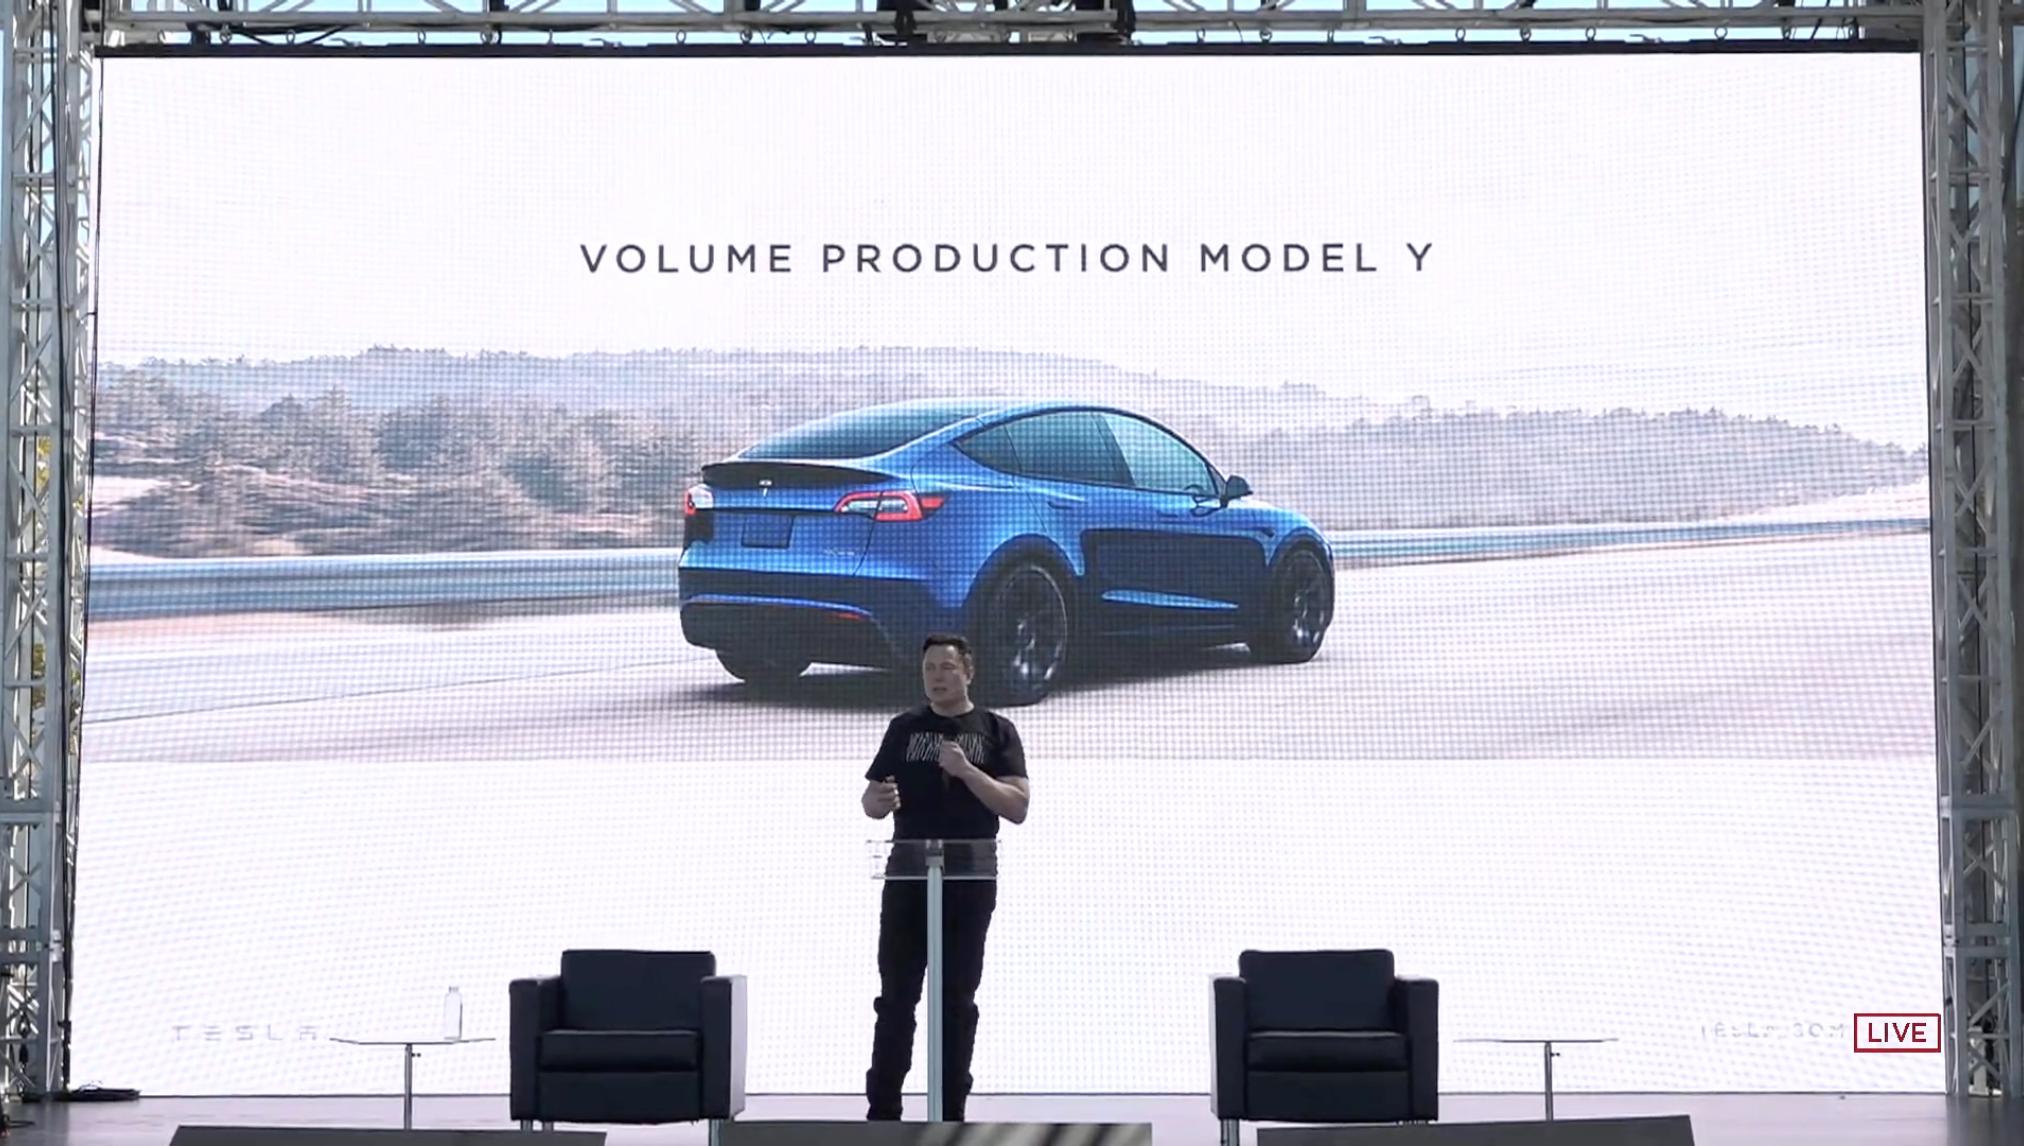 tesla-model-y-volume-production